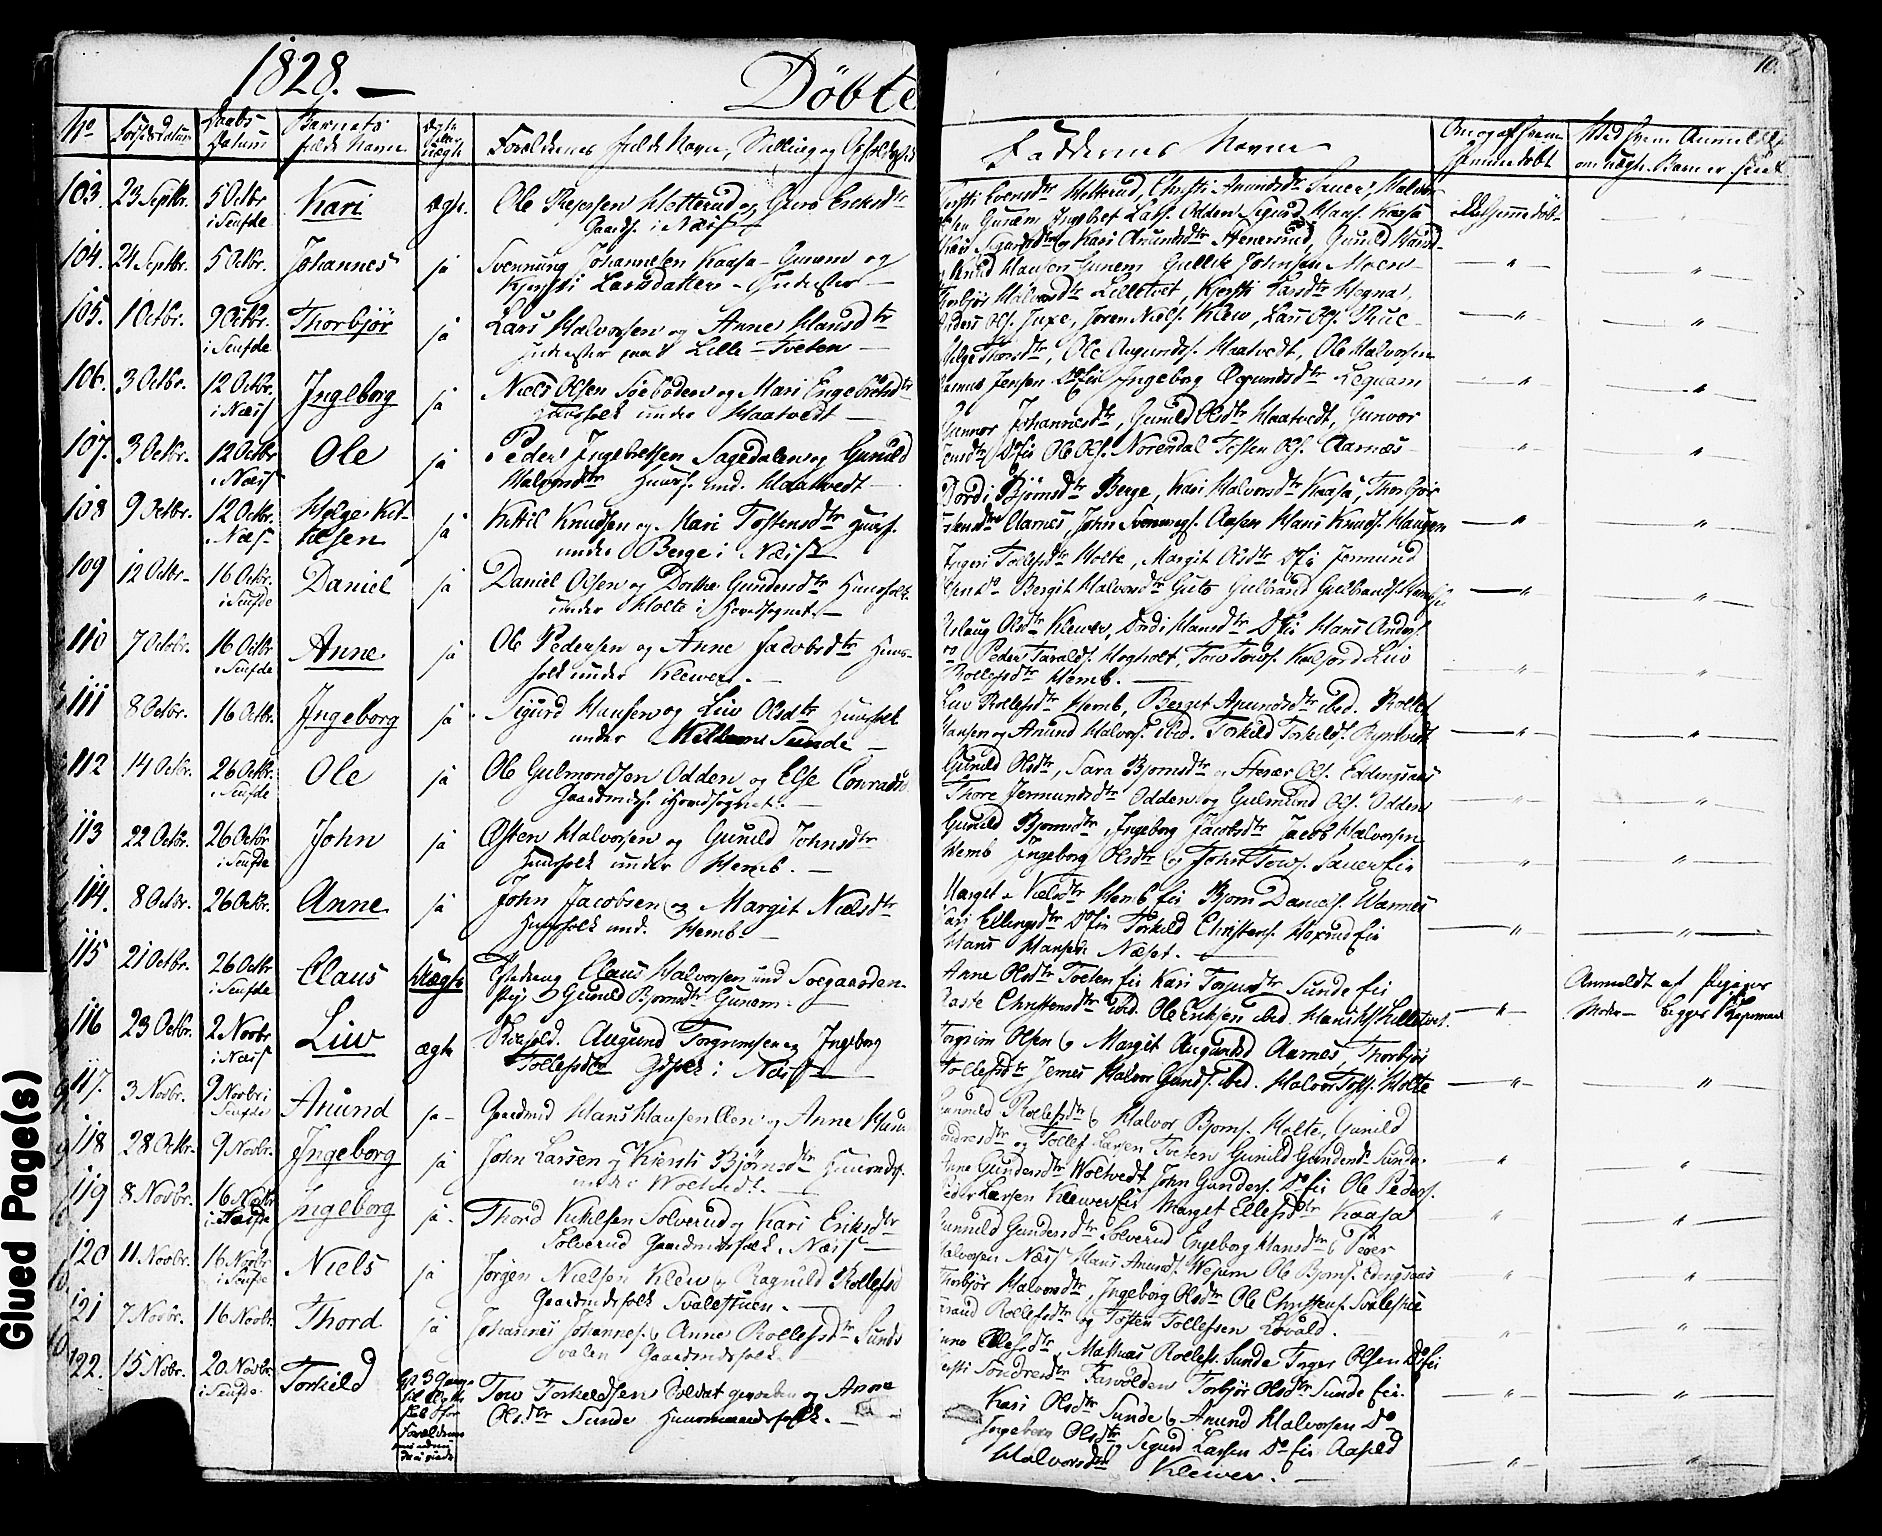 SAKO, Sauherad kirkebøker, F/Fa/L0006: Ministerialbok nr. I 6, 1827-1850, s. 10